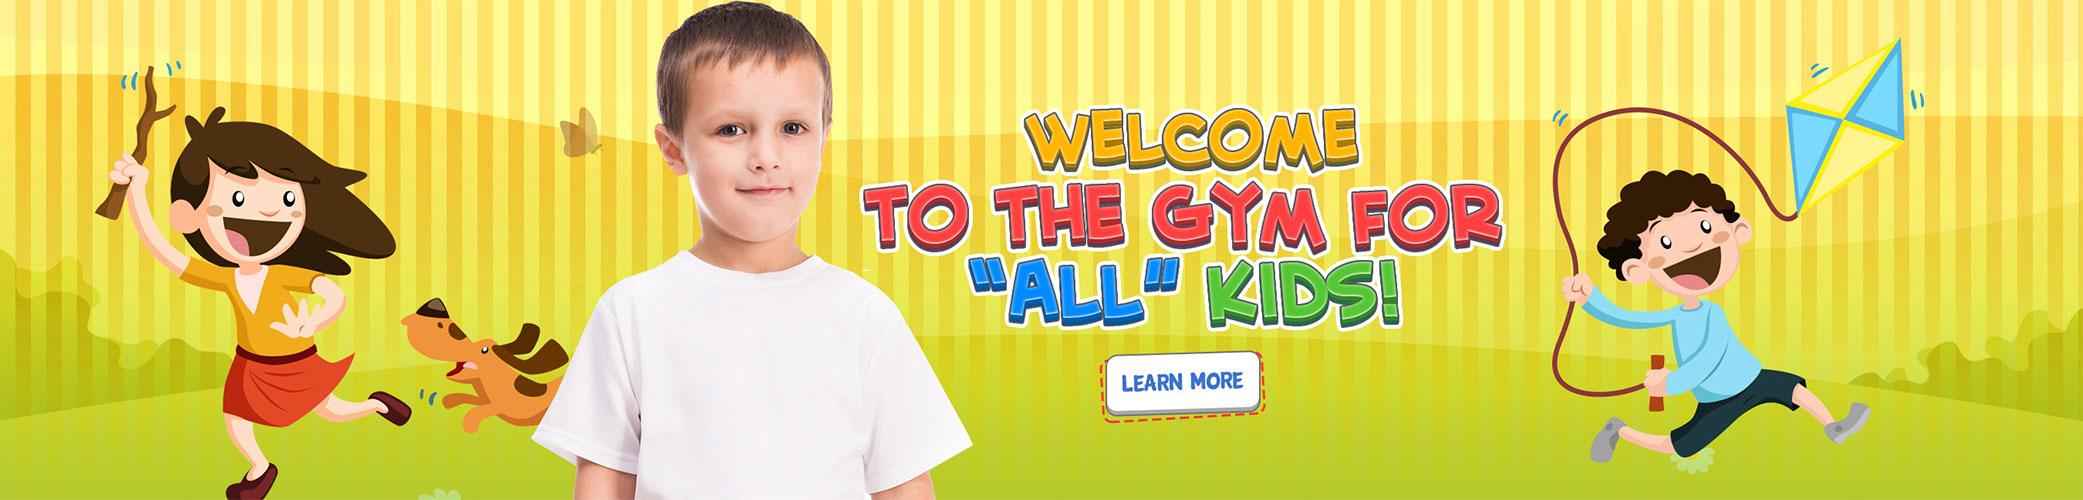 WRTS Edwardsville/ Gym for All Kids/ Autism